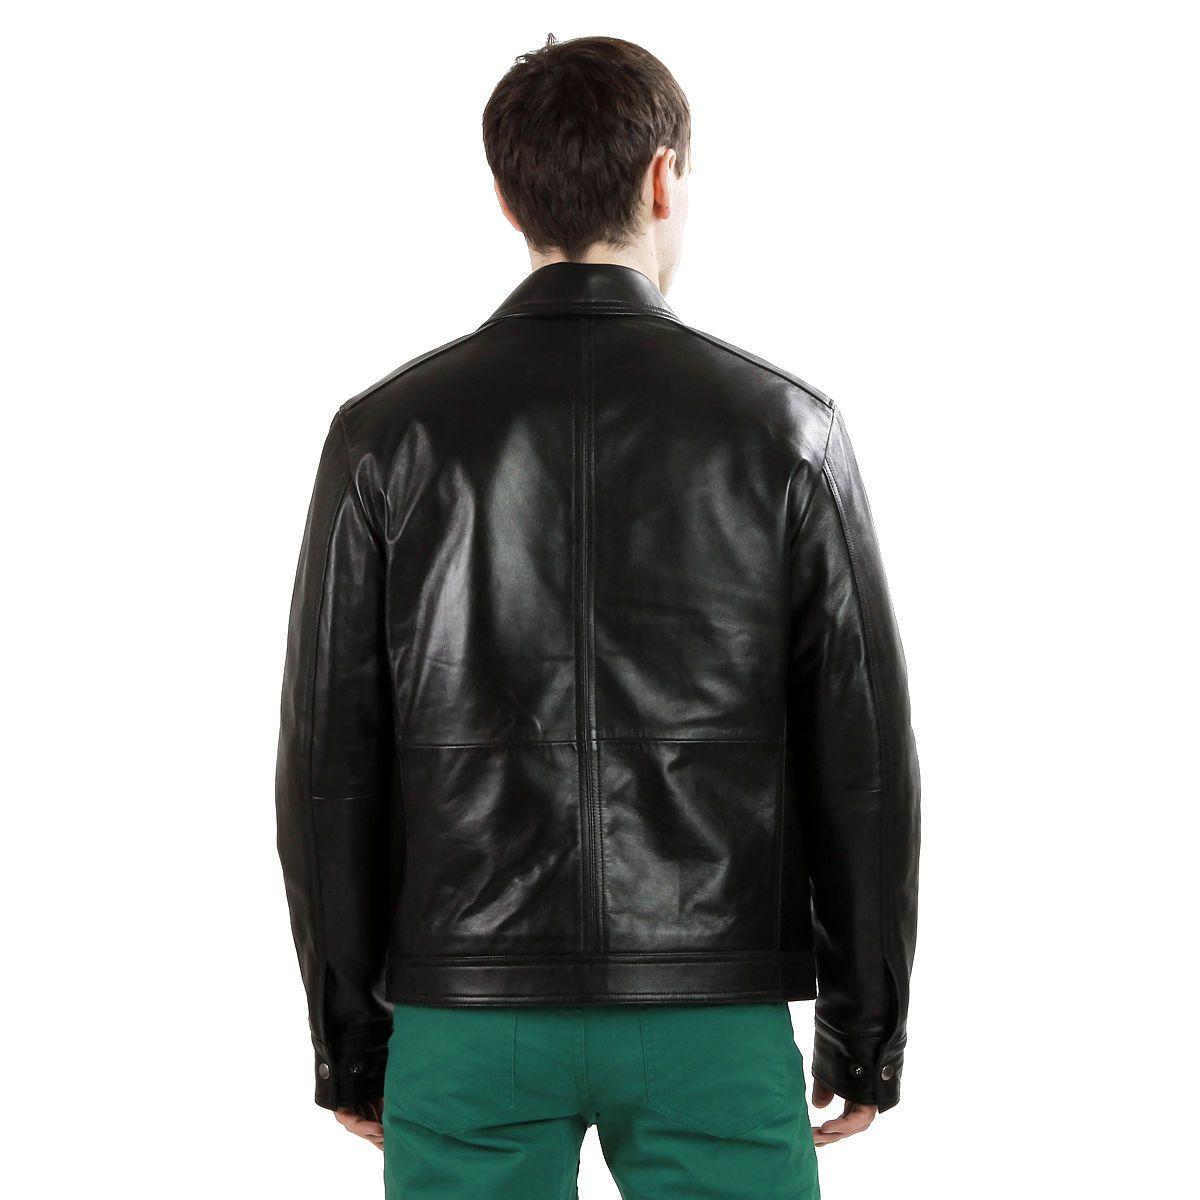 New Mens Black Leather Jacket Lambskin Hipster Zip Jacket M L XL 2XL 3XL | eBay